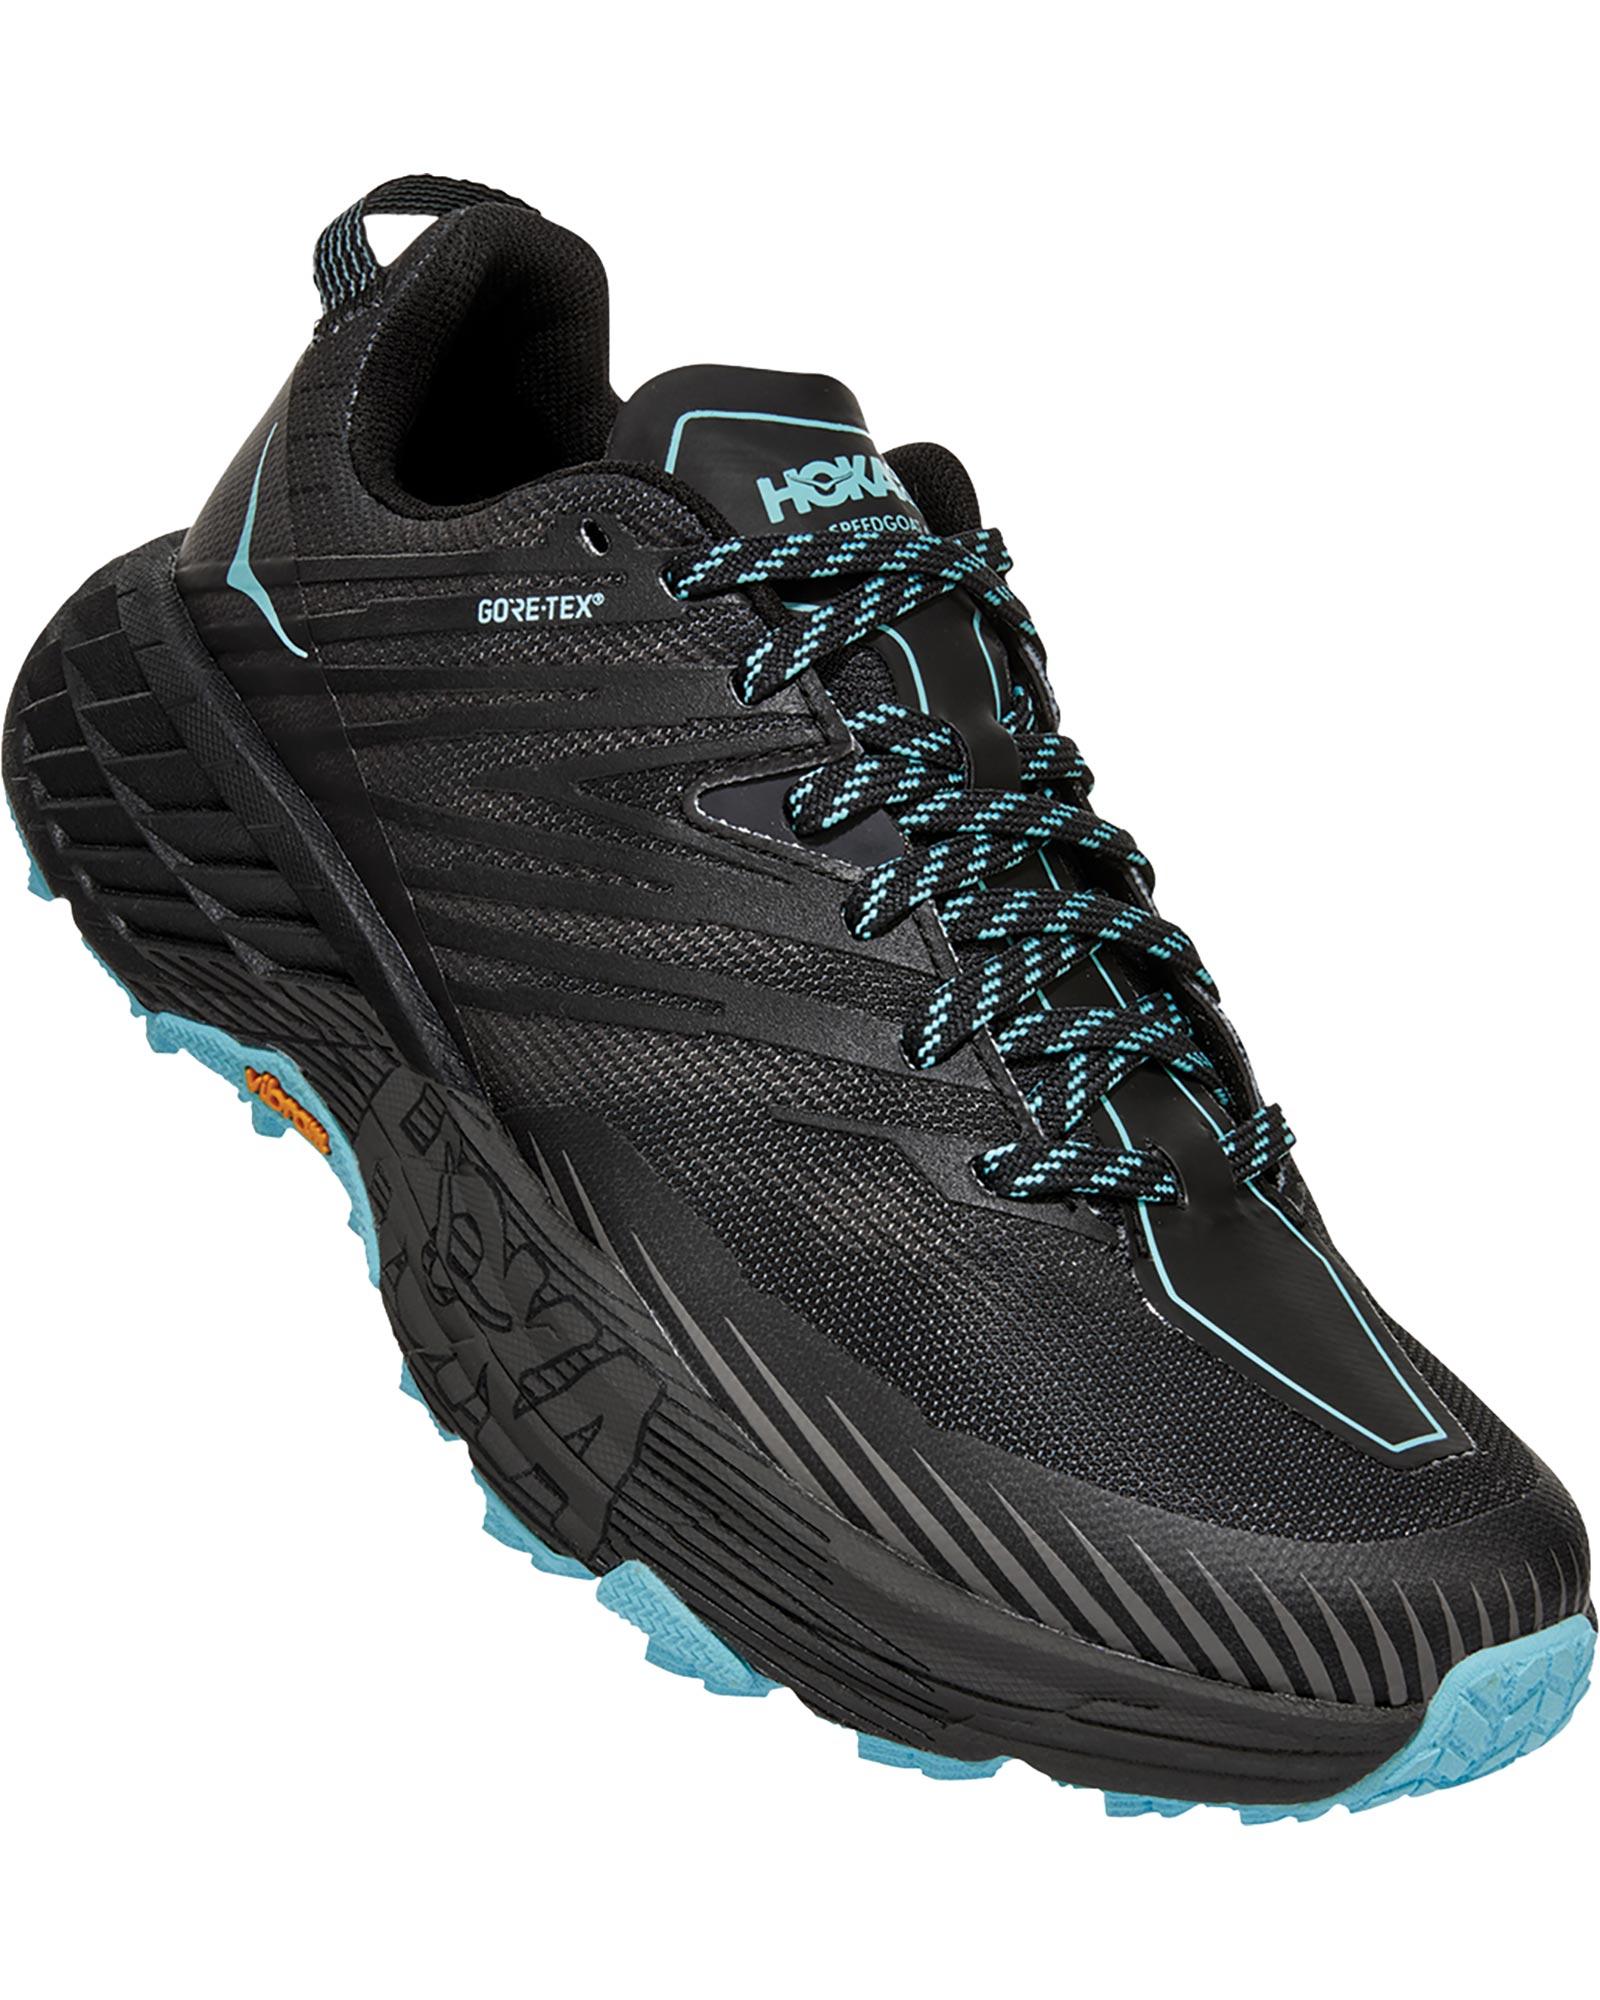 Hoka One One Speedgoat 4 GORE-TEX Women's Shoes 0